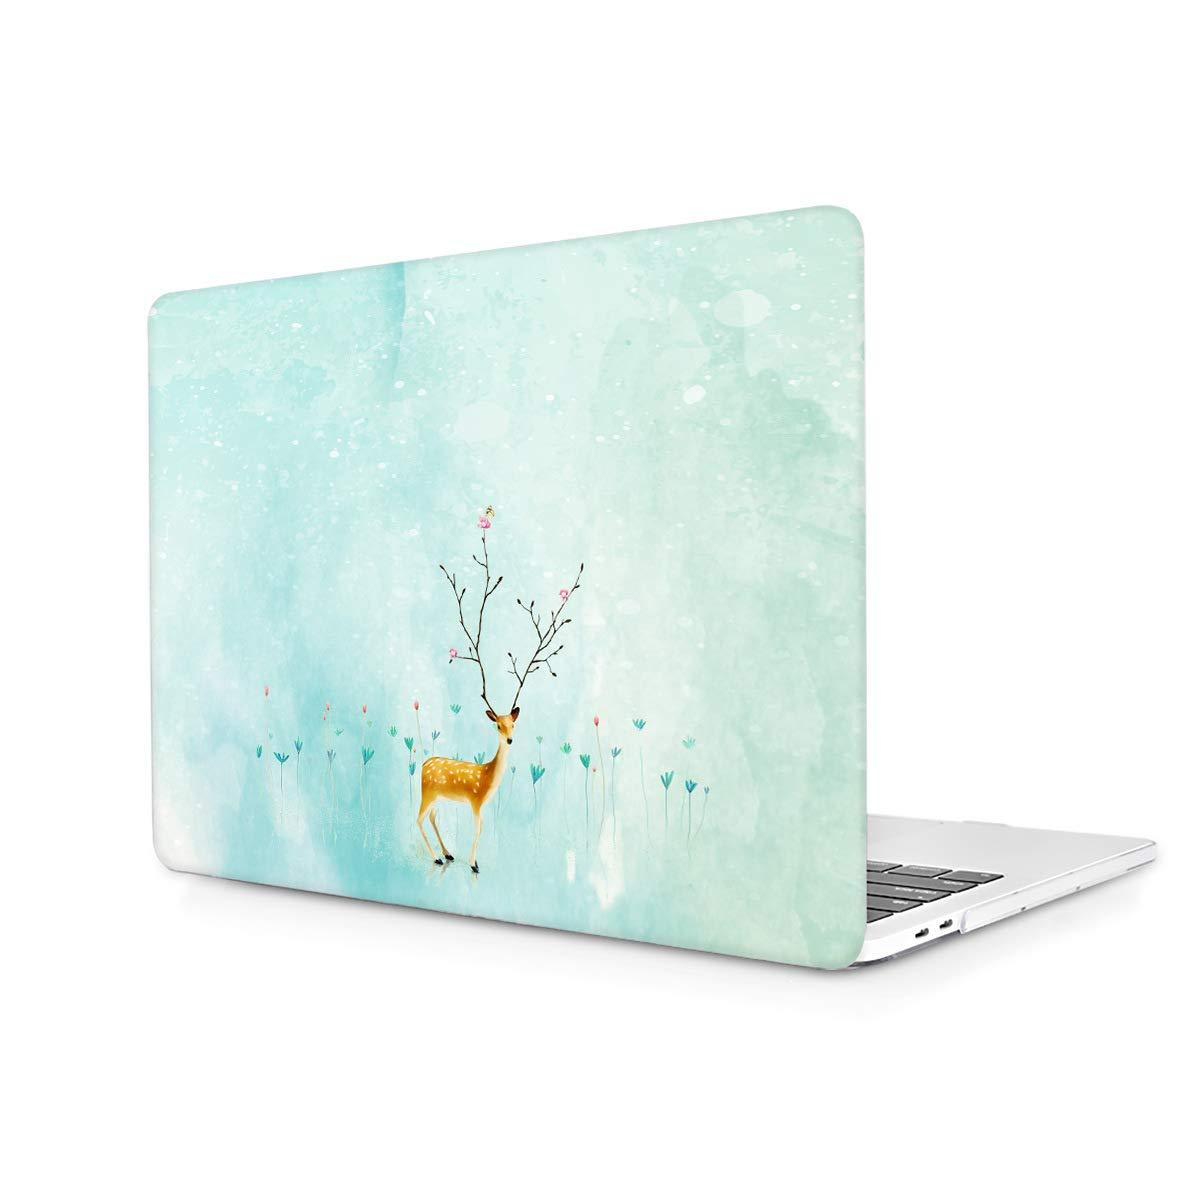 TwoL Funda Duras Carcasa para MacBook Pro 13-13.3 Pulgadas Avec CD-ROM A1278 Venado Sika